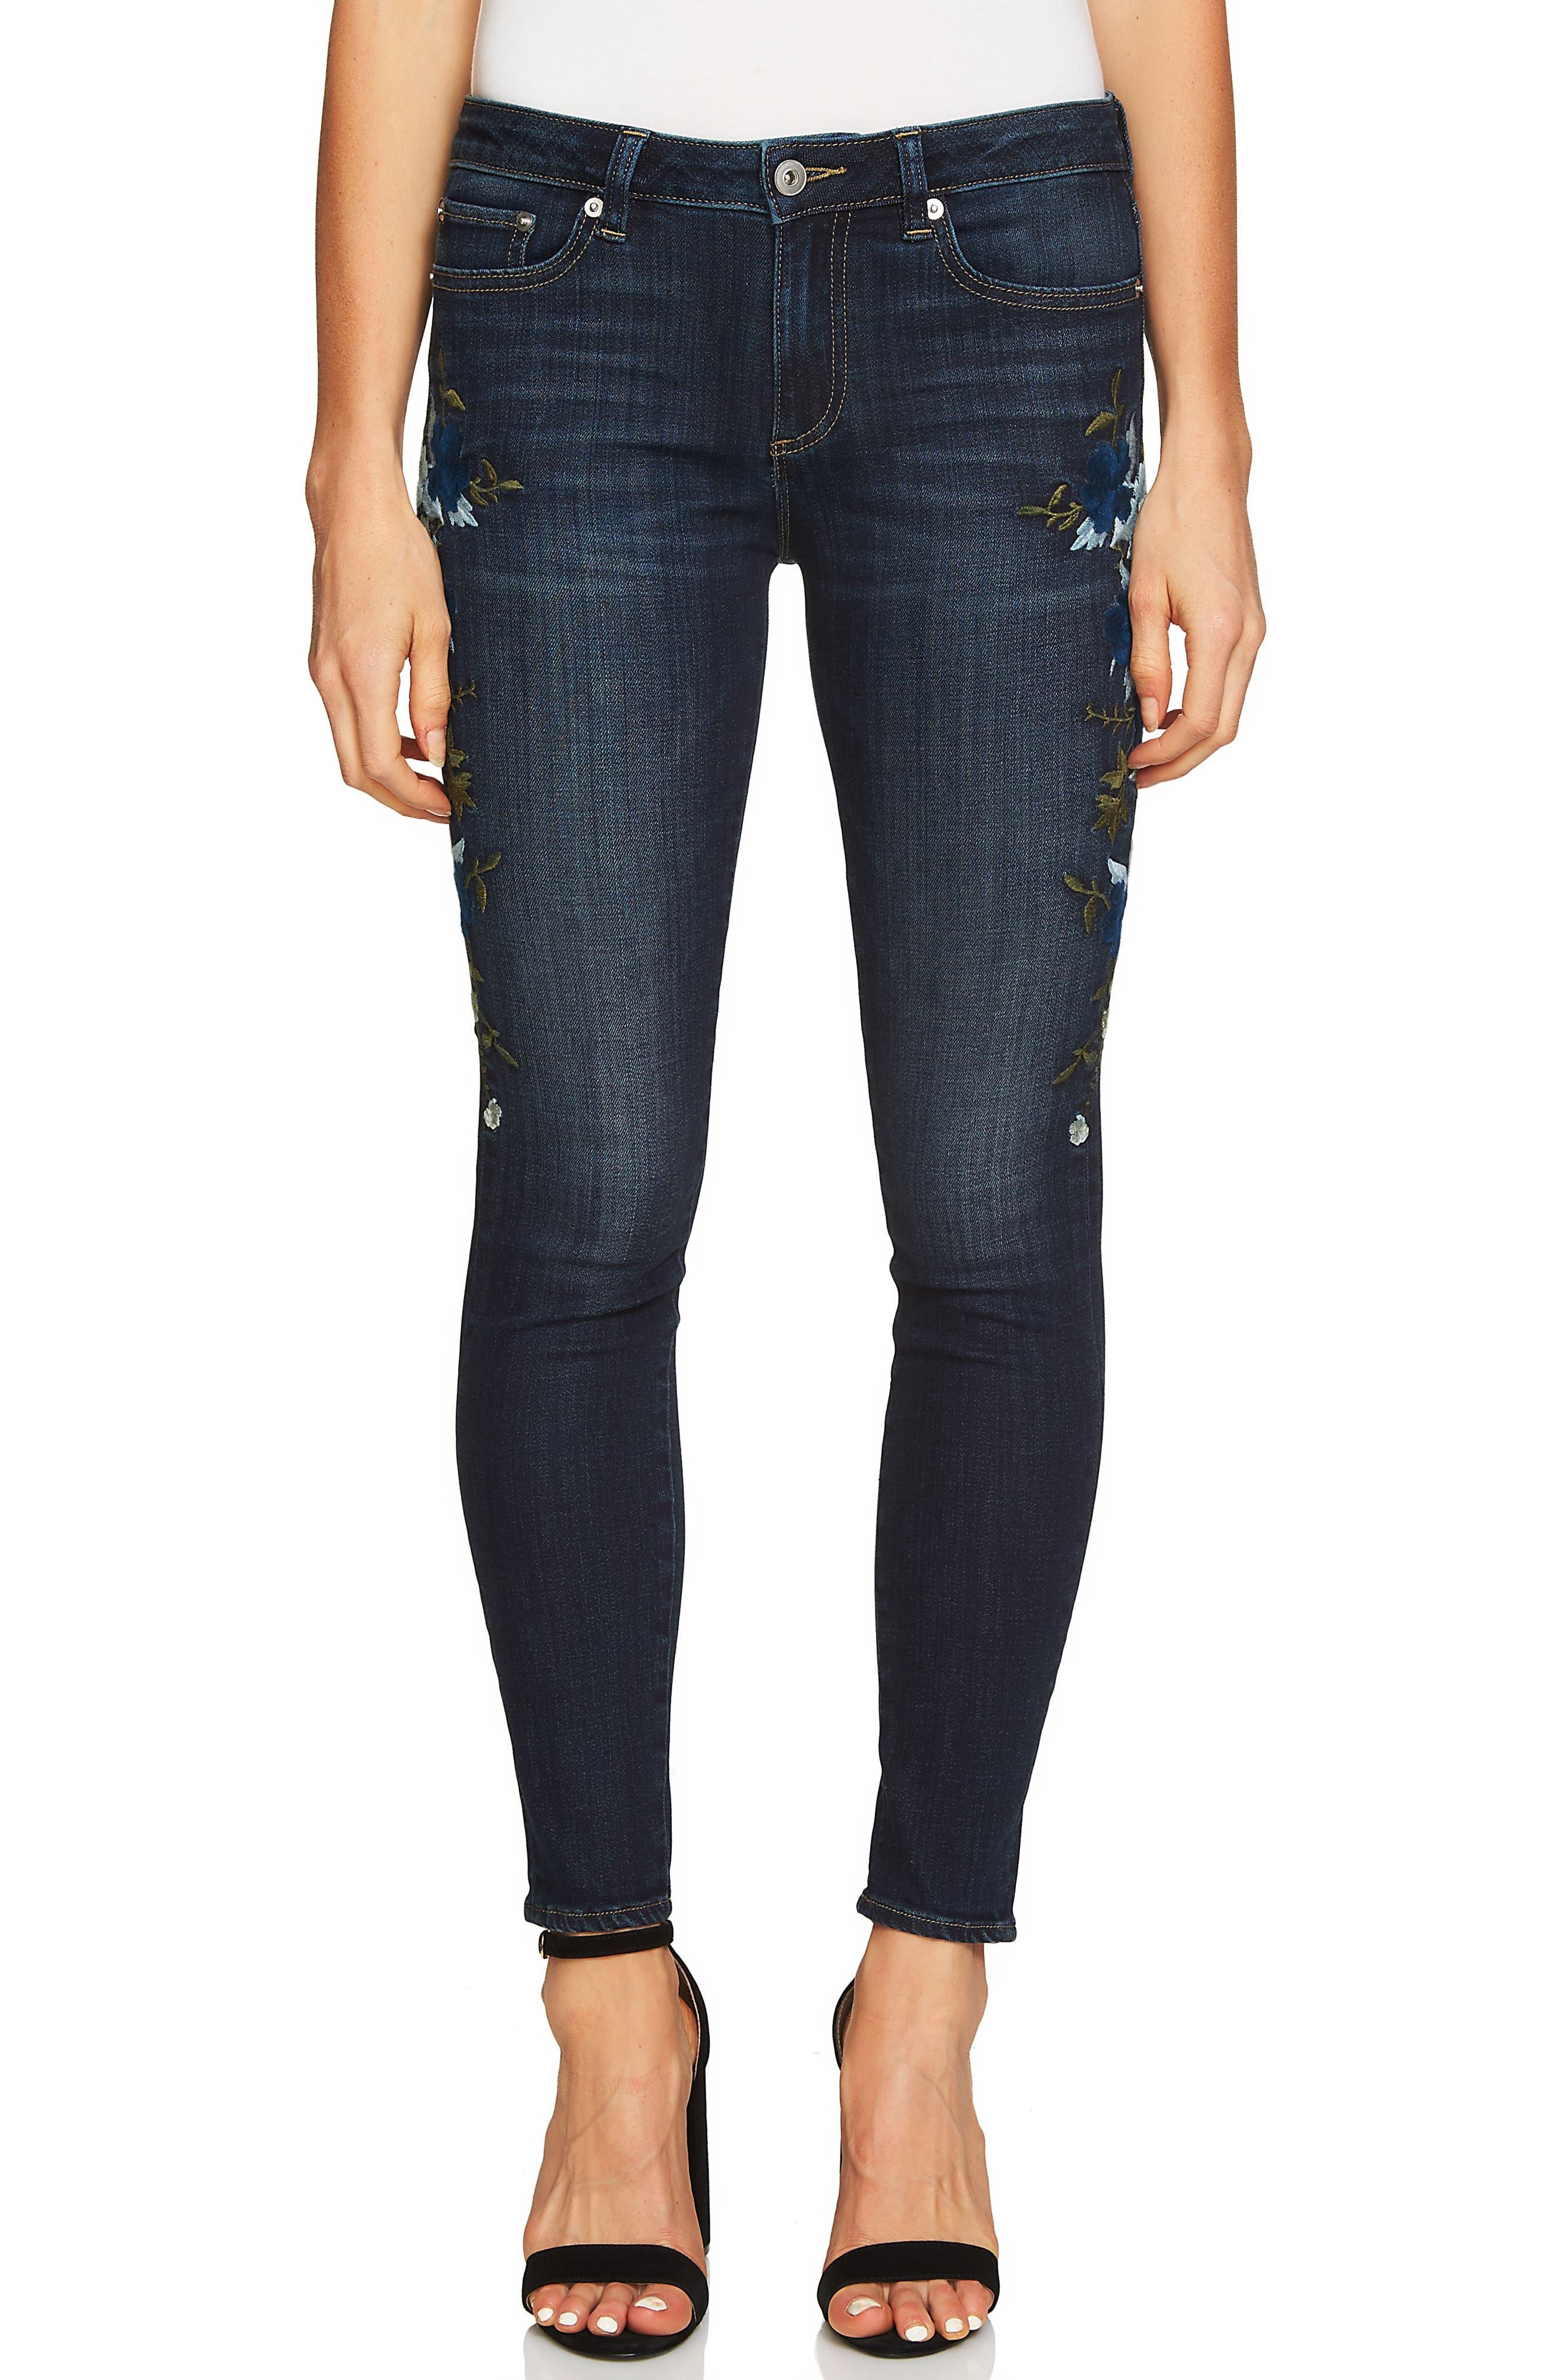 CeCe Indigo Denim Floral Embroidered Jeans